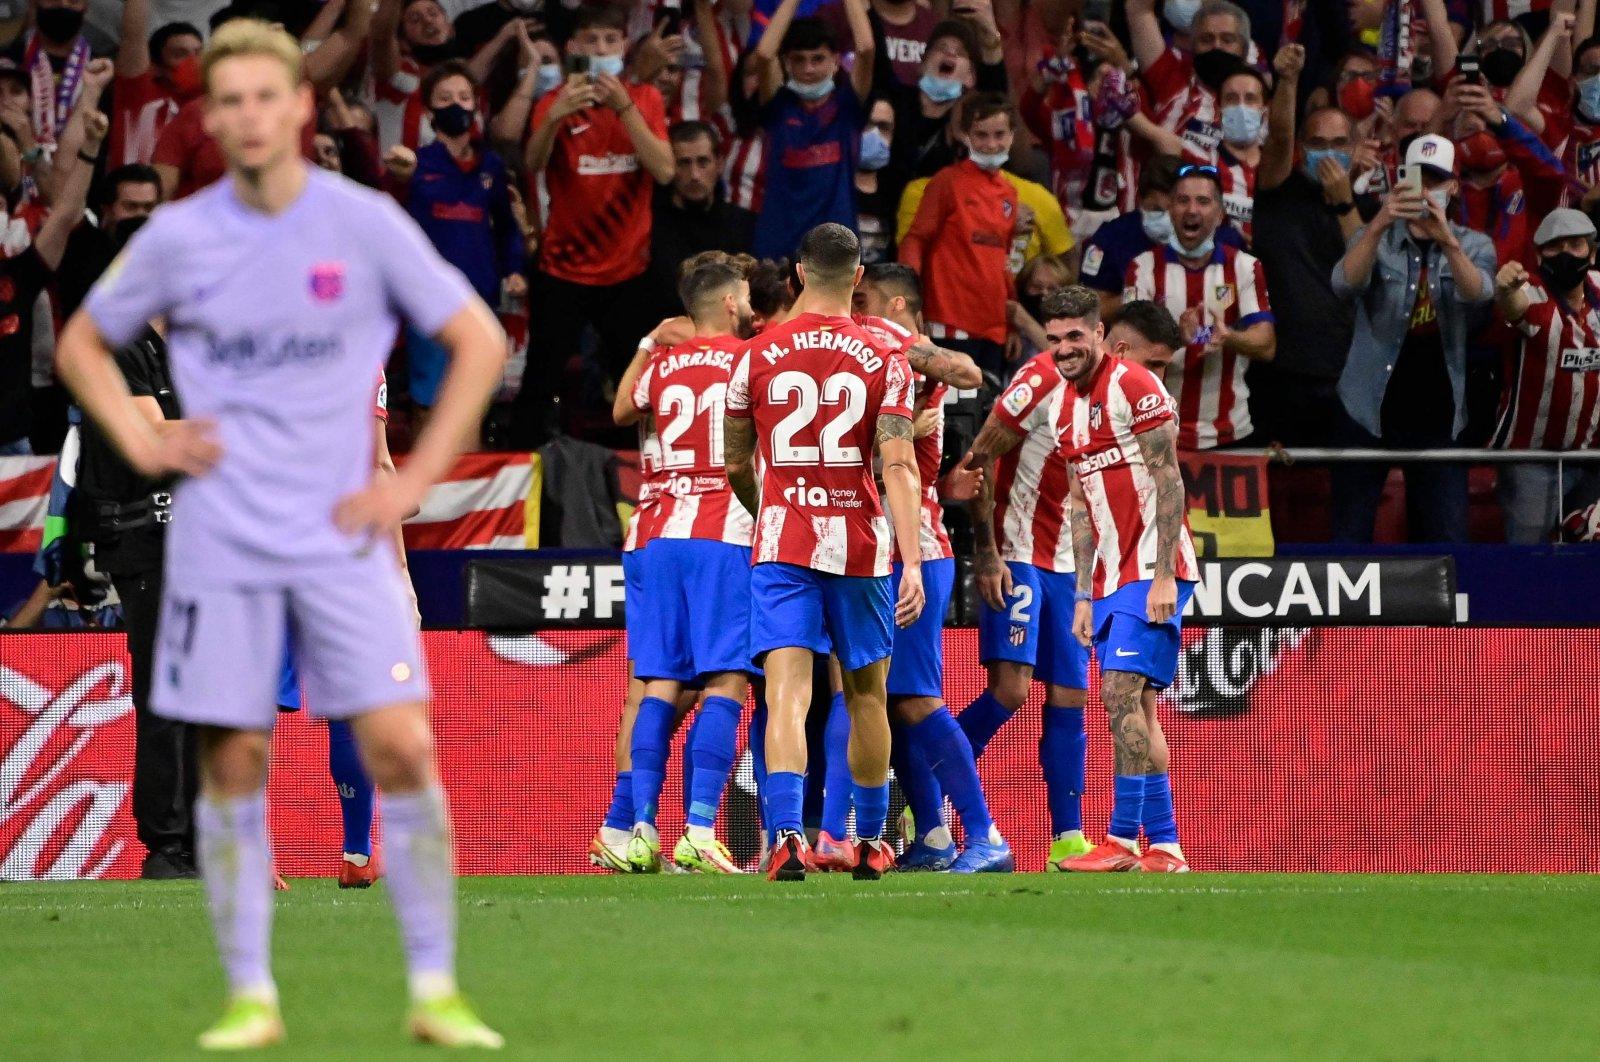 Atletico Madrid players celebrate a goal during a La Liga match against Atletico Madrid at the Wanda Metropolitano stadium, Madrid, Spain, Oct. 2, 2021. (AFP Photo)